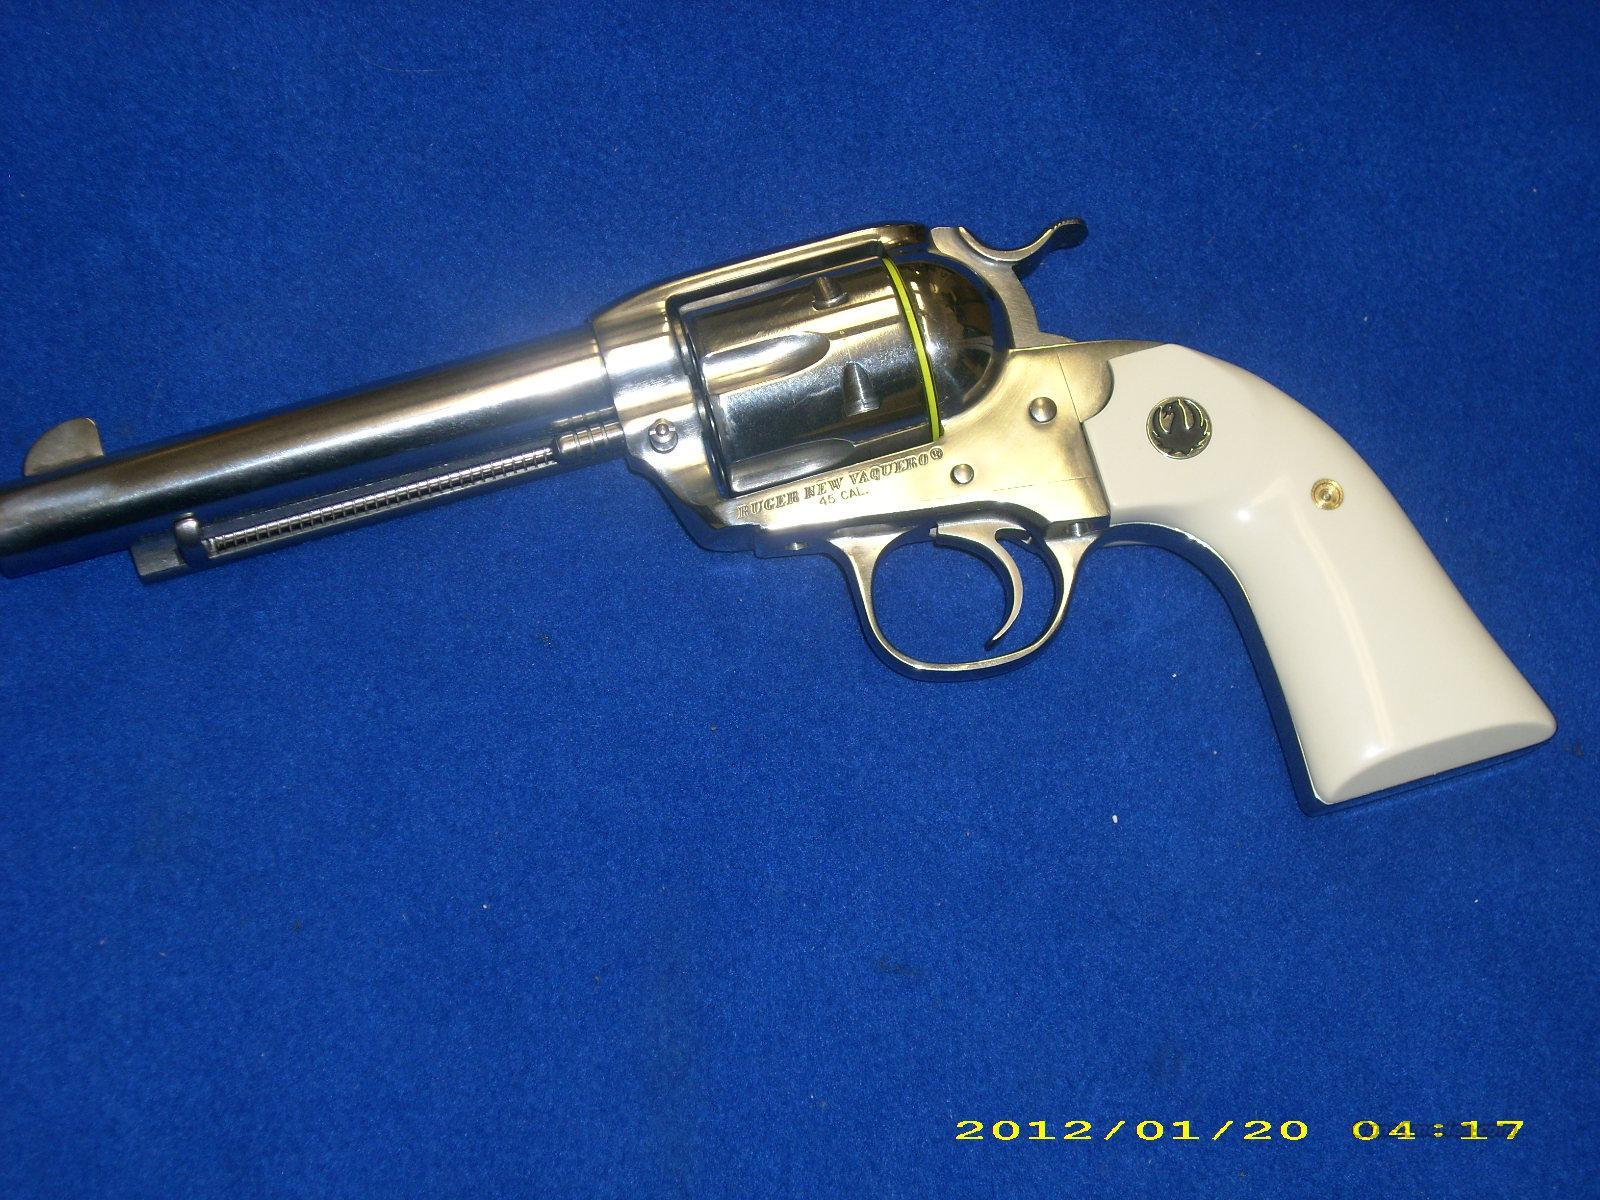 Ruger Vaquero .45 Colt Ivory Grips #5129  Guns > Pistols > Ruger Single Action Revolvers > Cowboy Action